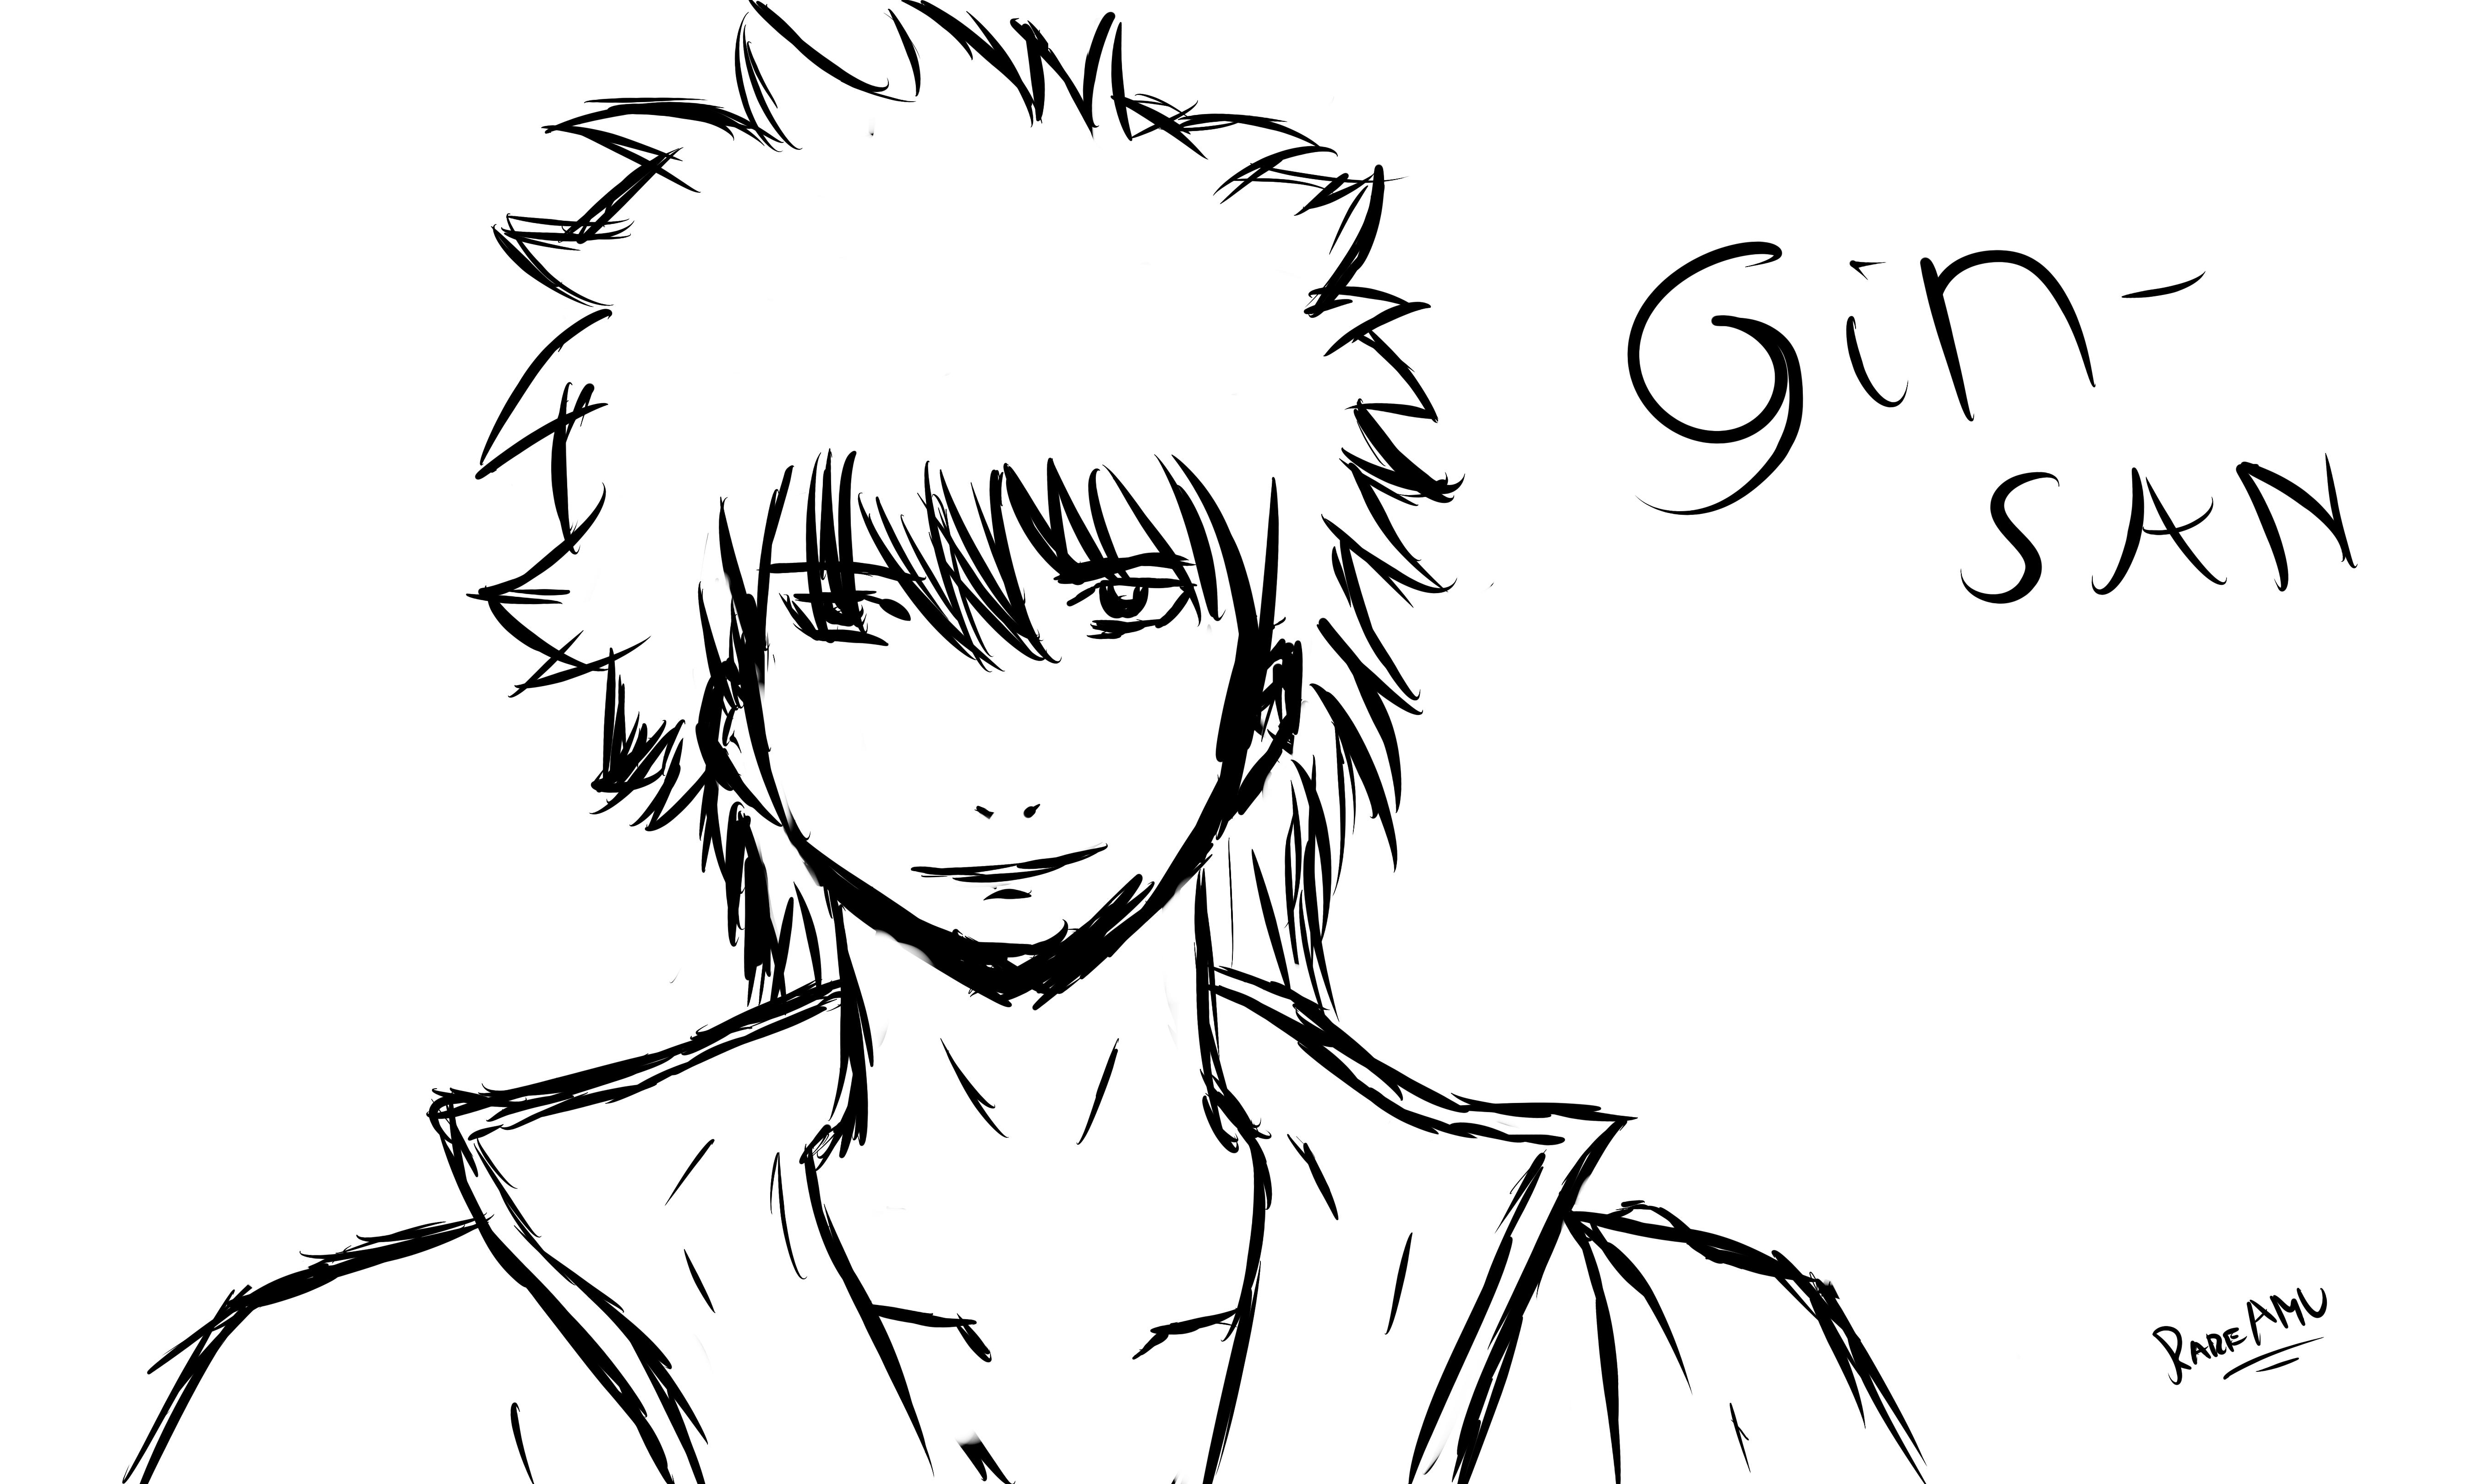 Gin-San's sketch by RareAMV